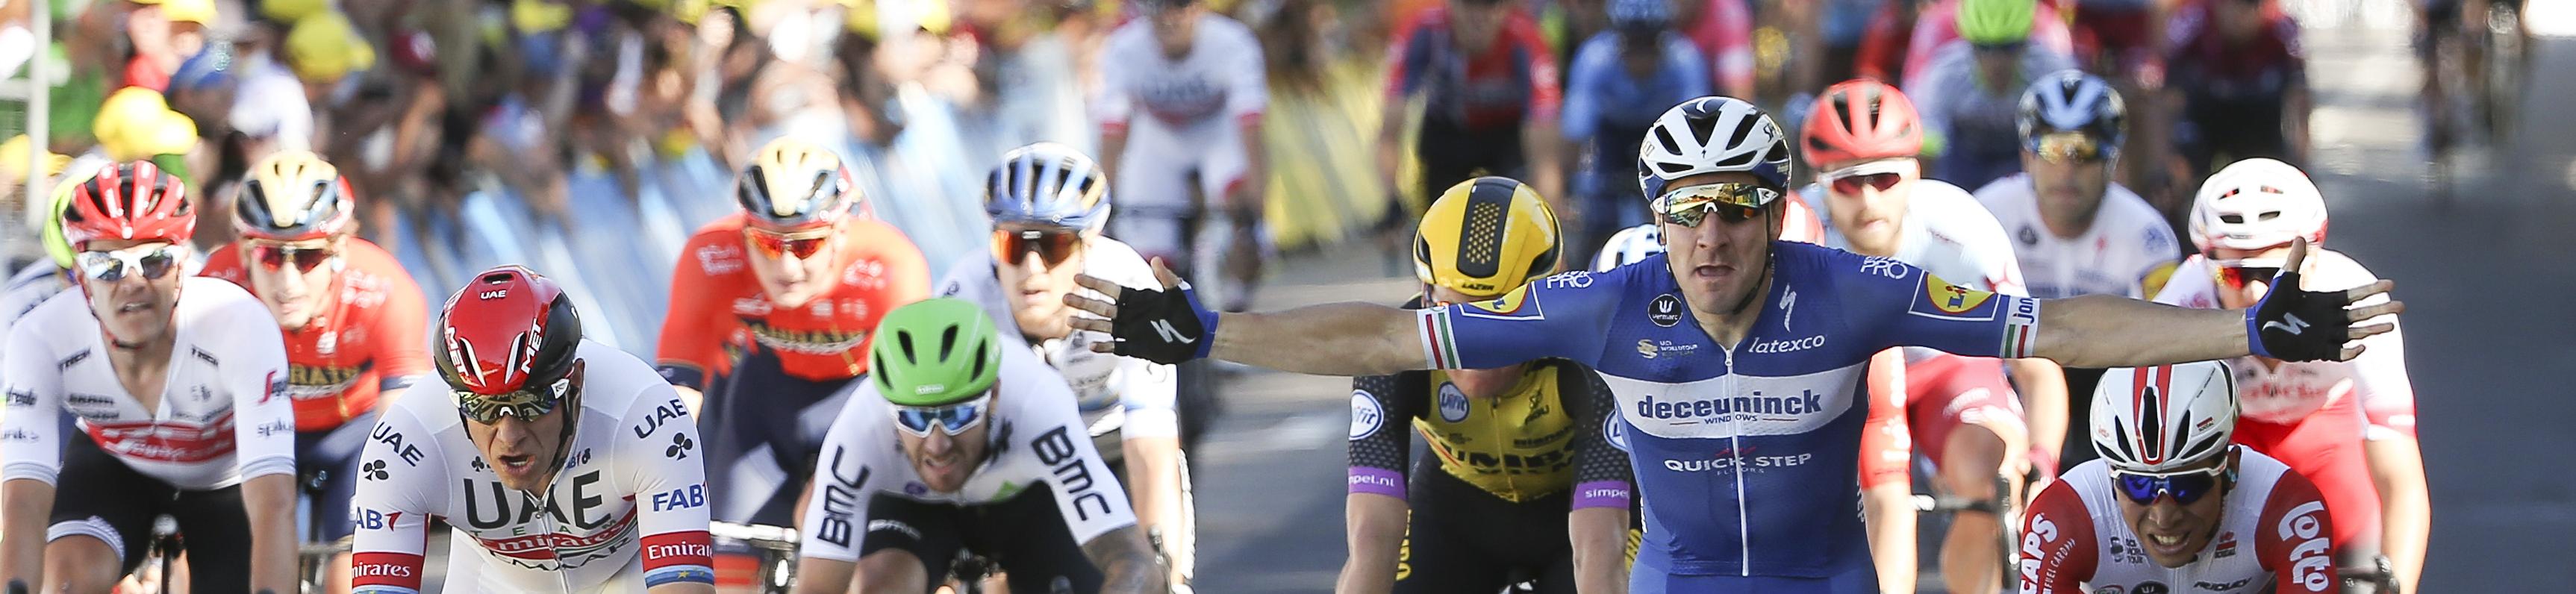 Tour de France 2019, tappa 7: Viviani si candida per il bis